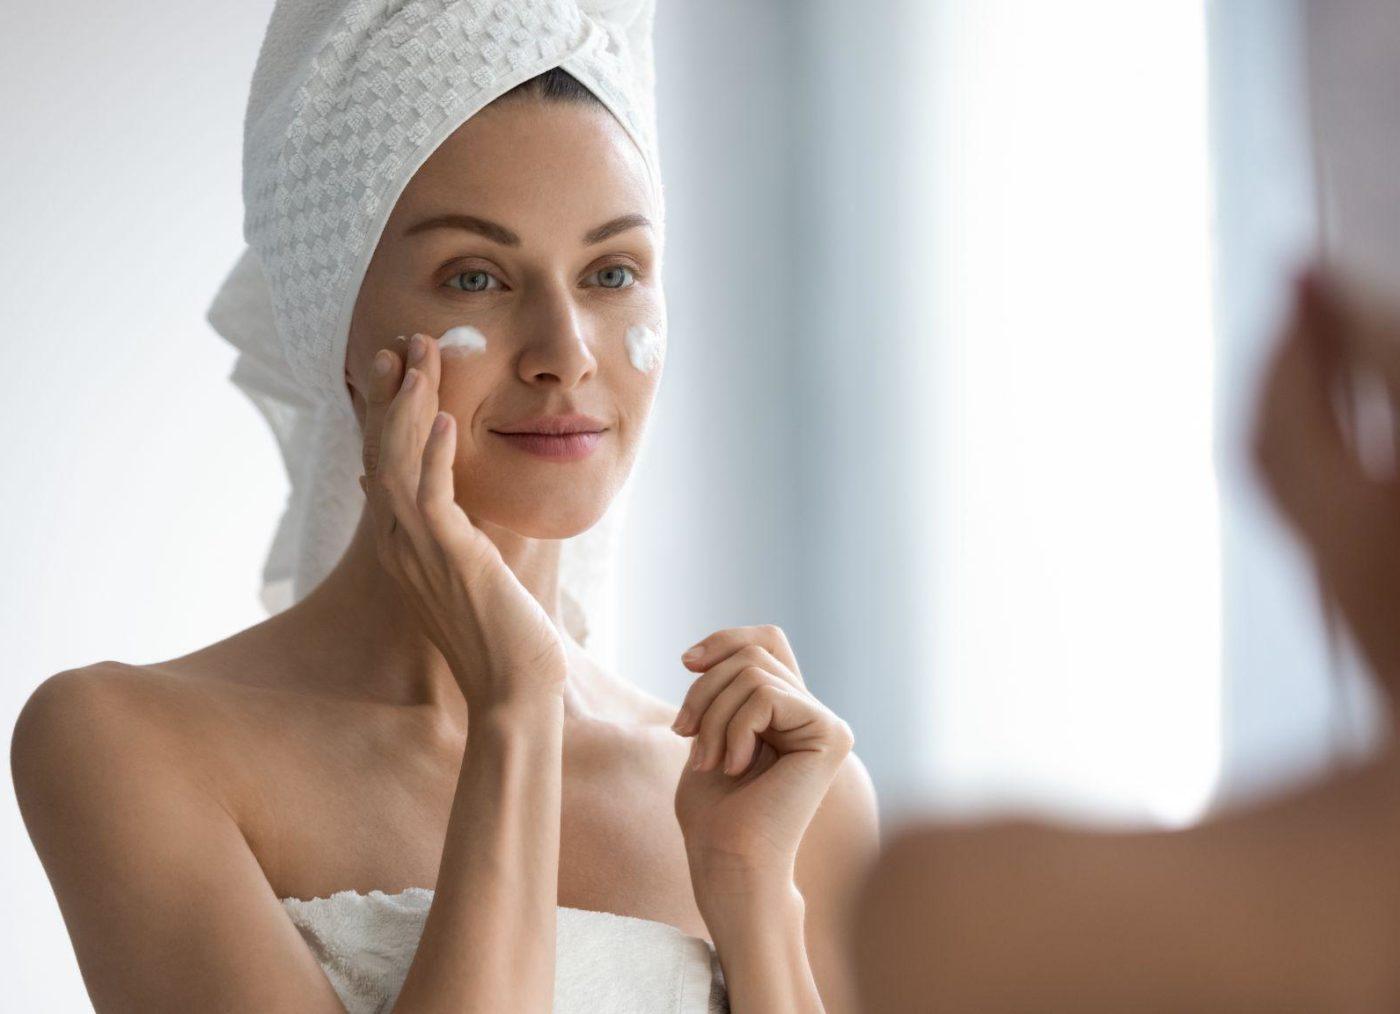 Attractive young adult woman apply facial cream look in mirror